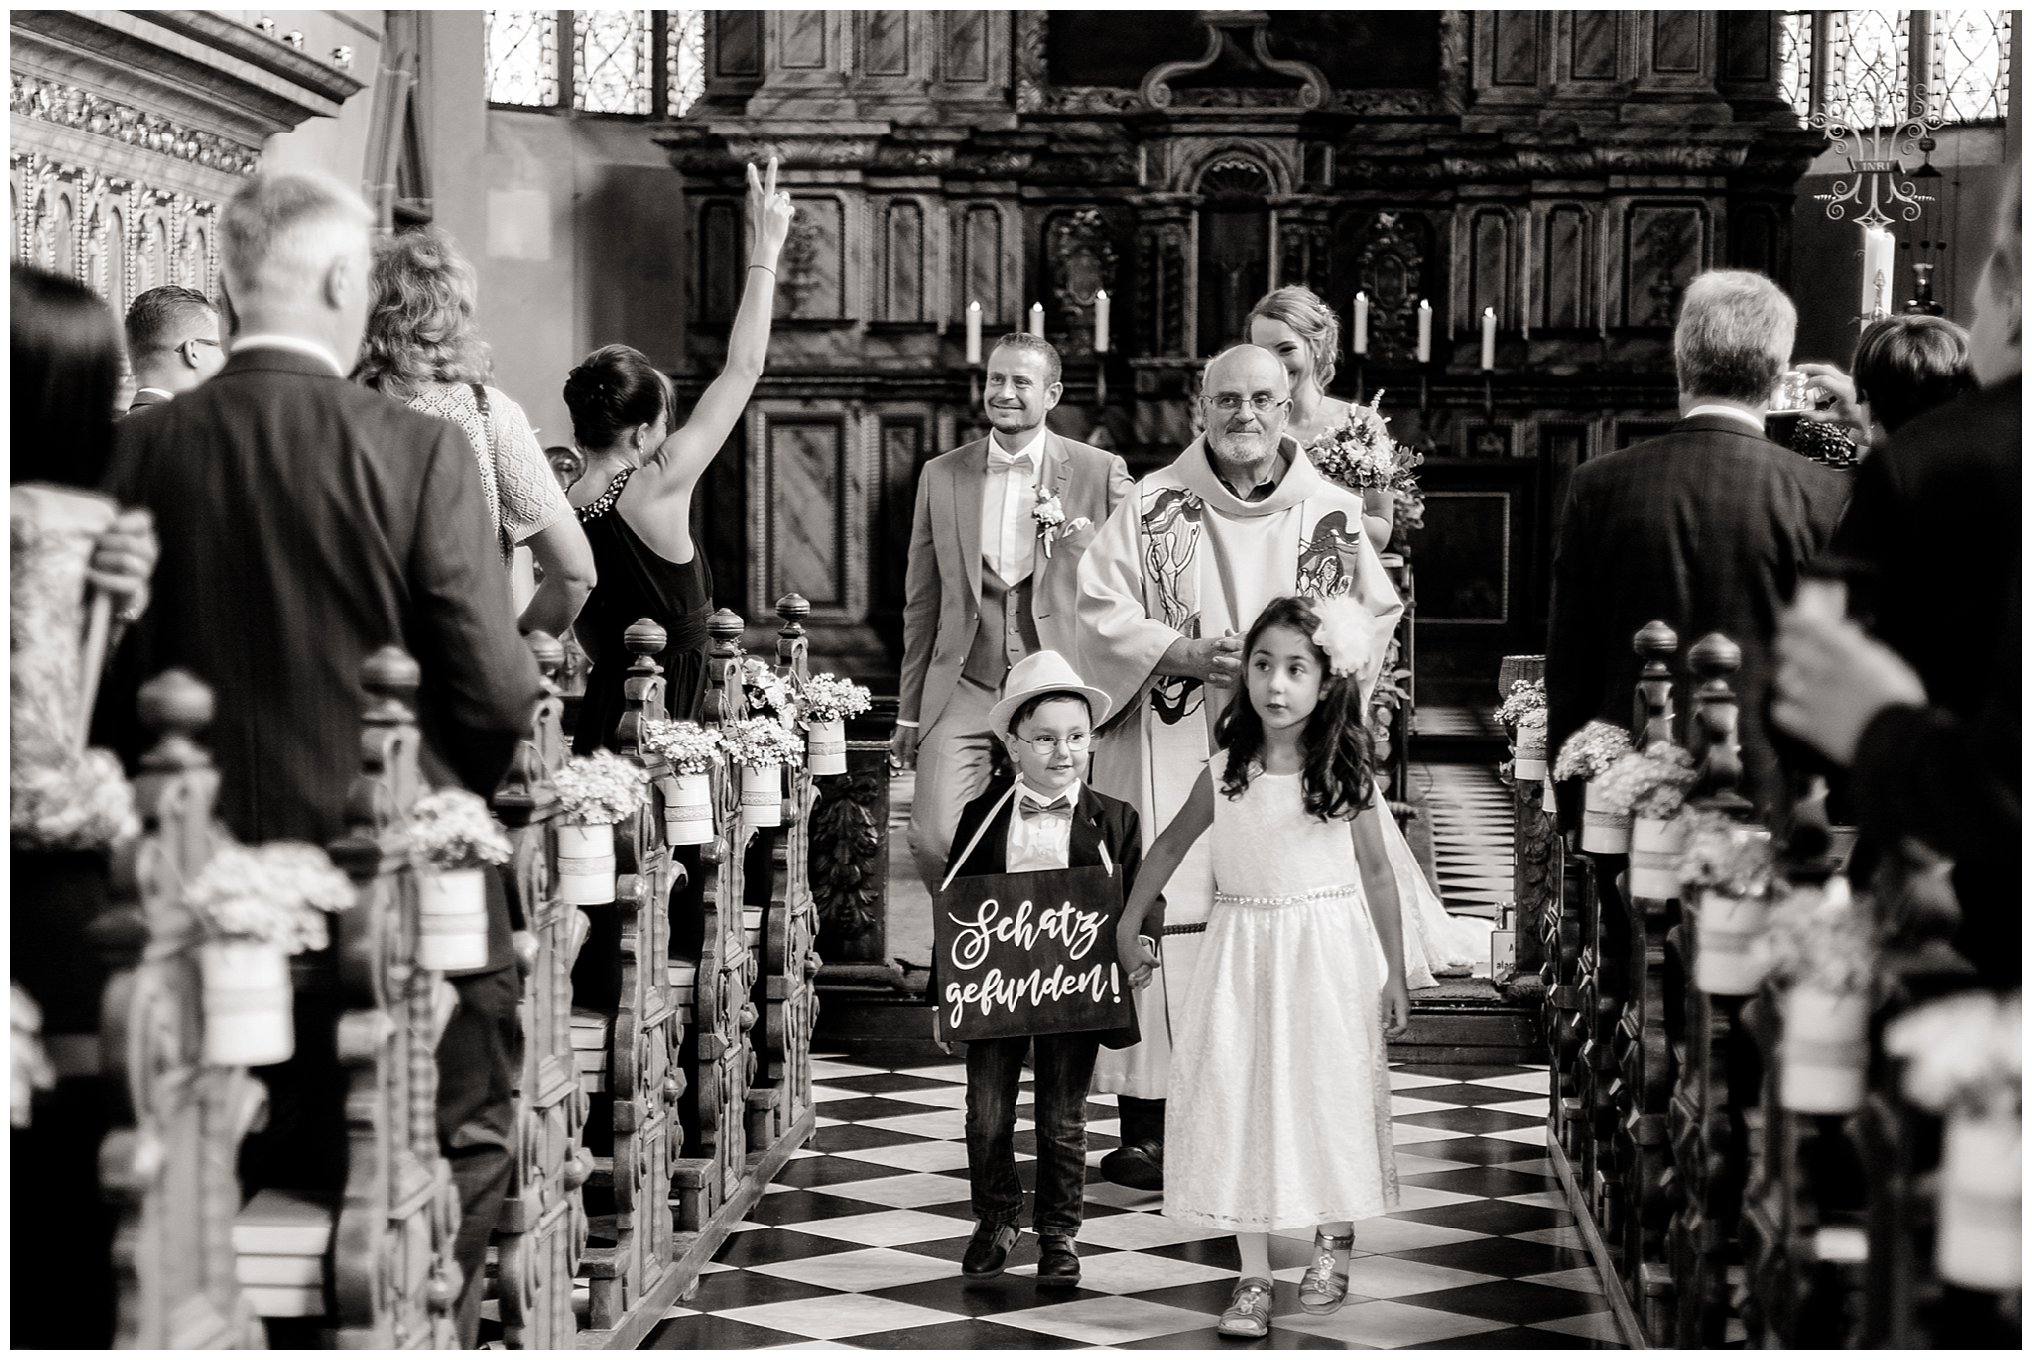 Auszug Kirche Golfhotel Vesper Hochzeit Sprockhövel Hochzeitsfotograf Jane Weber boho chic vintage fine art